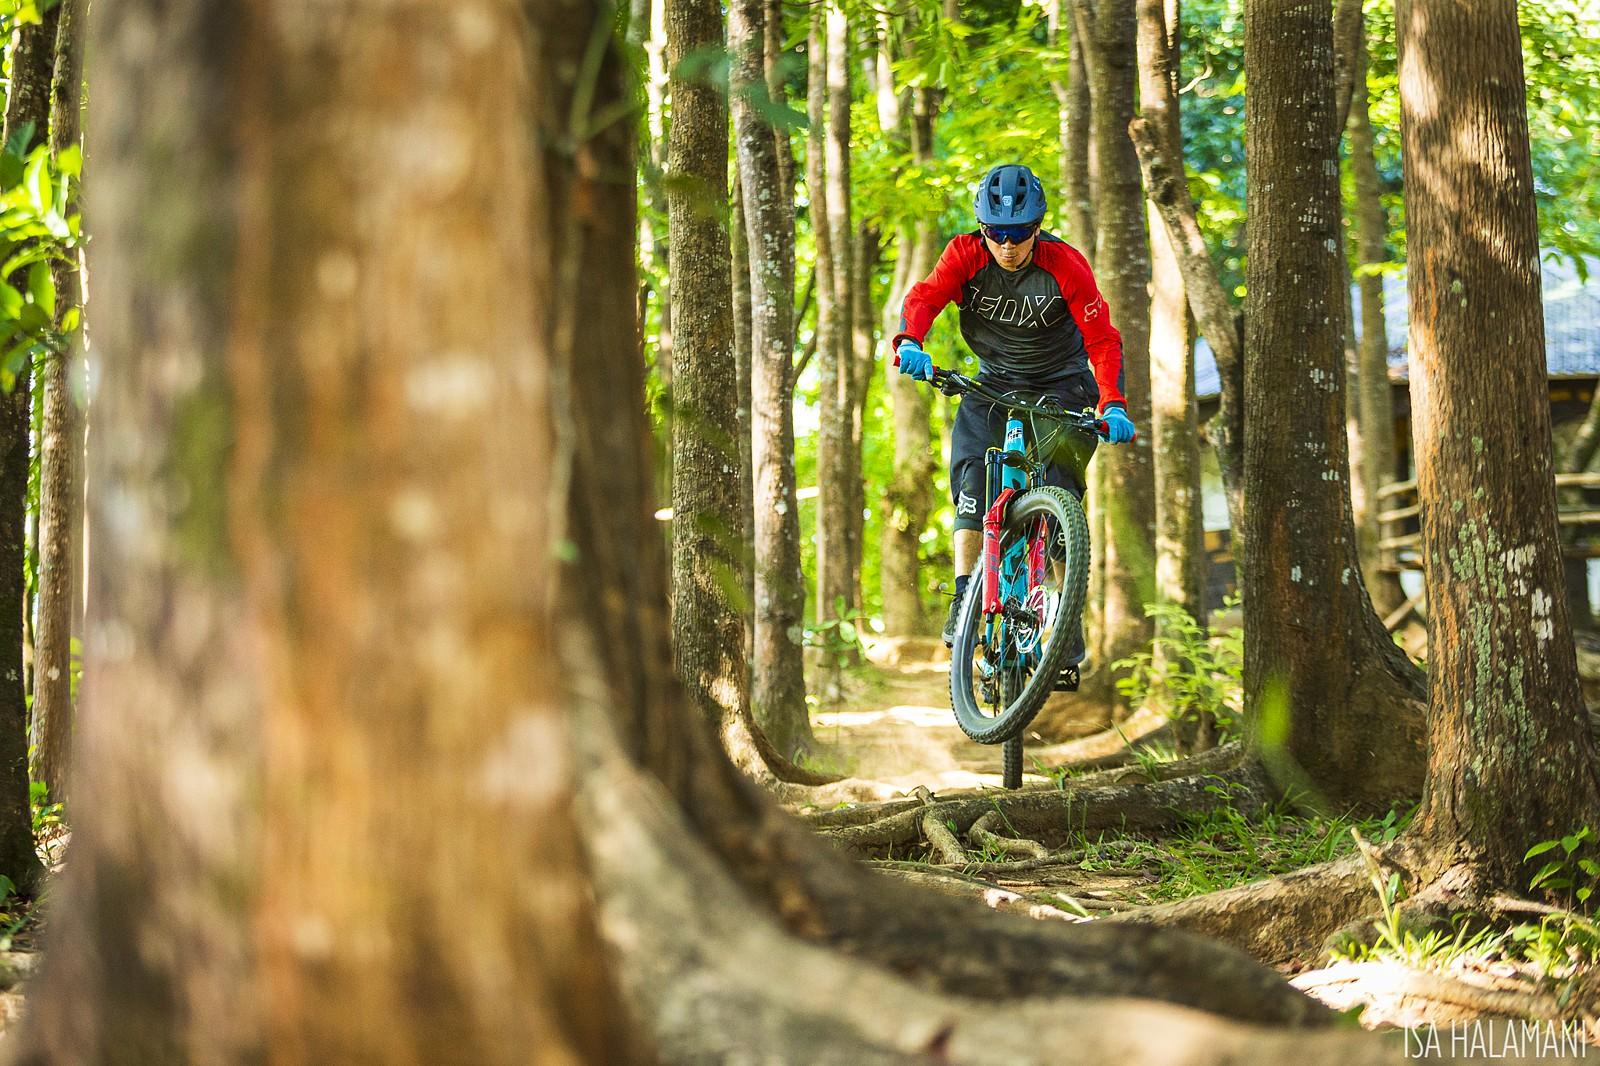 Roots at Corterra - imhalamani - Mountain Biking Pictures - Vital MTB